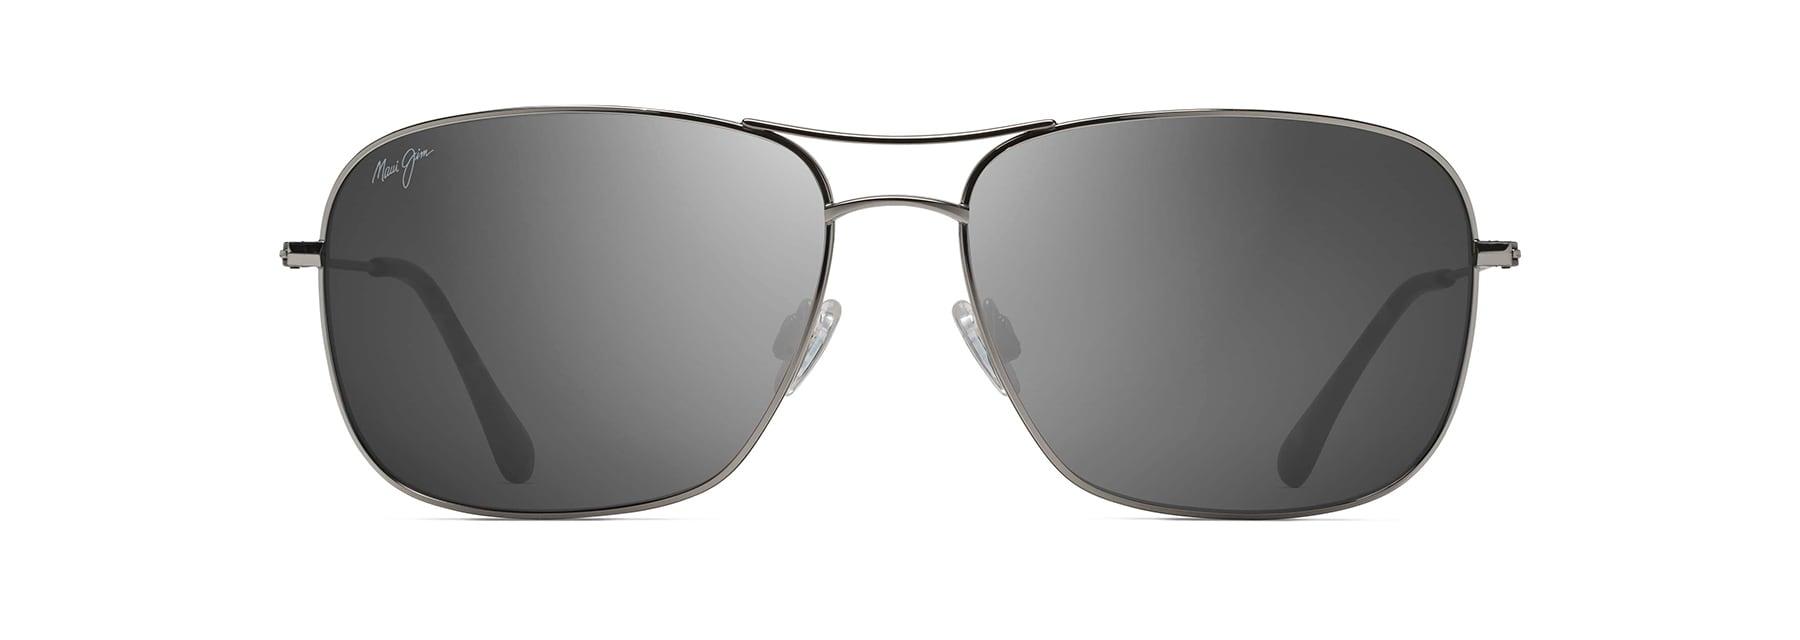 bdab74cdc5 Breezeway Polarized Sunglasses